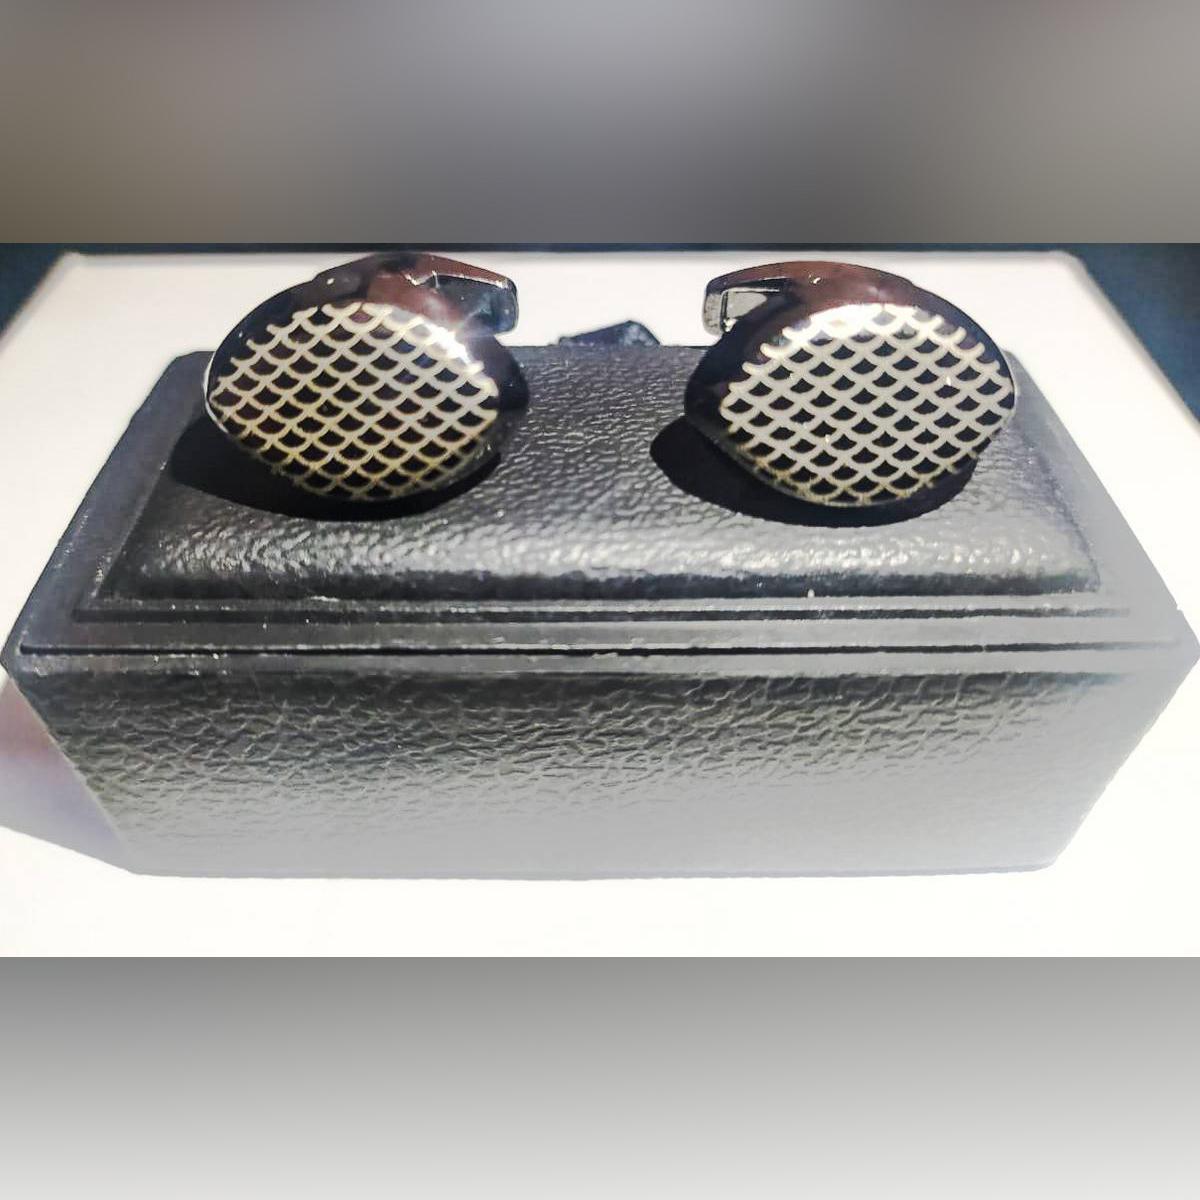 Classy Luxury Cufflinks for Men, Stylish Fashion Cuff Links for Men, Stainless Steel Black Cufflinks for Men, Cufflinks Gift for Him